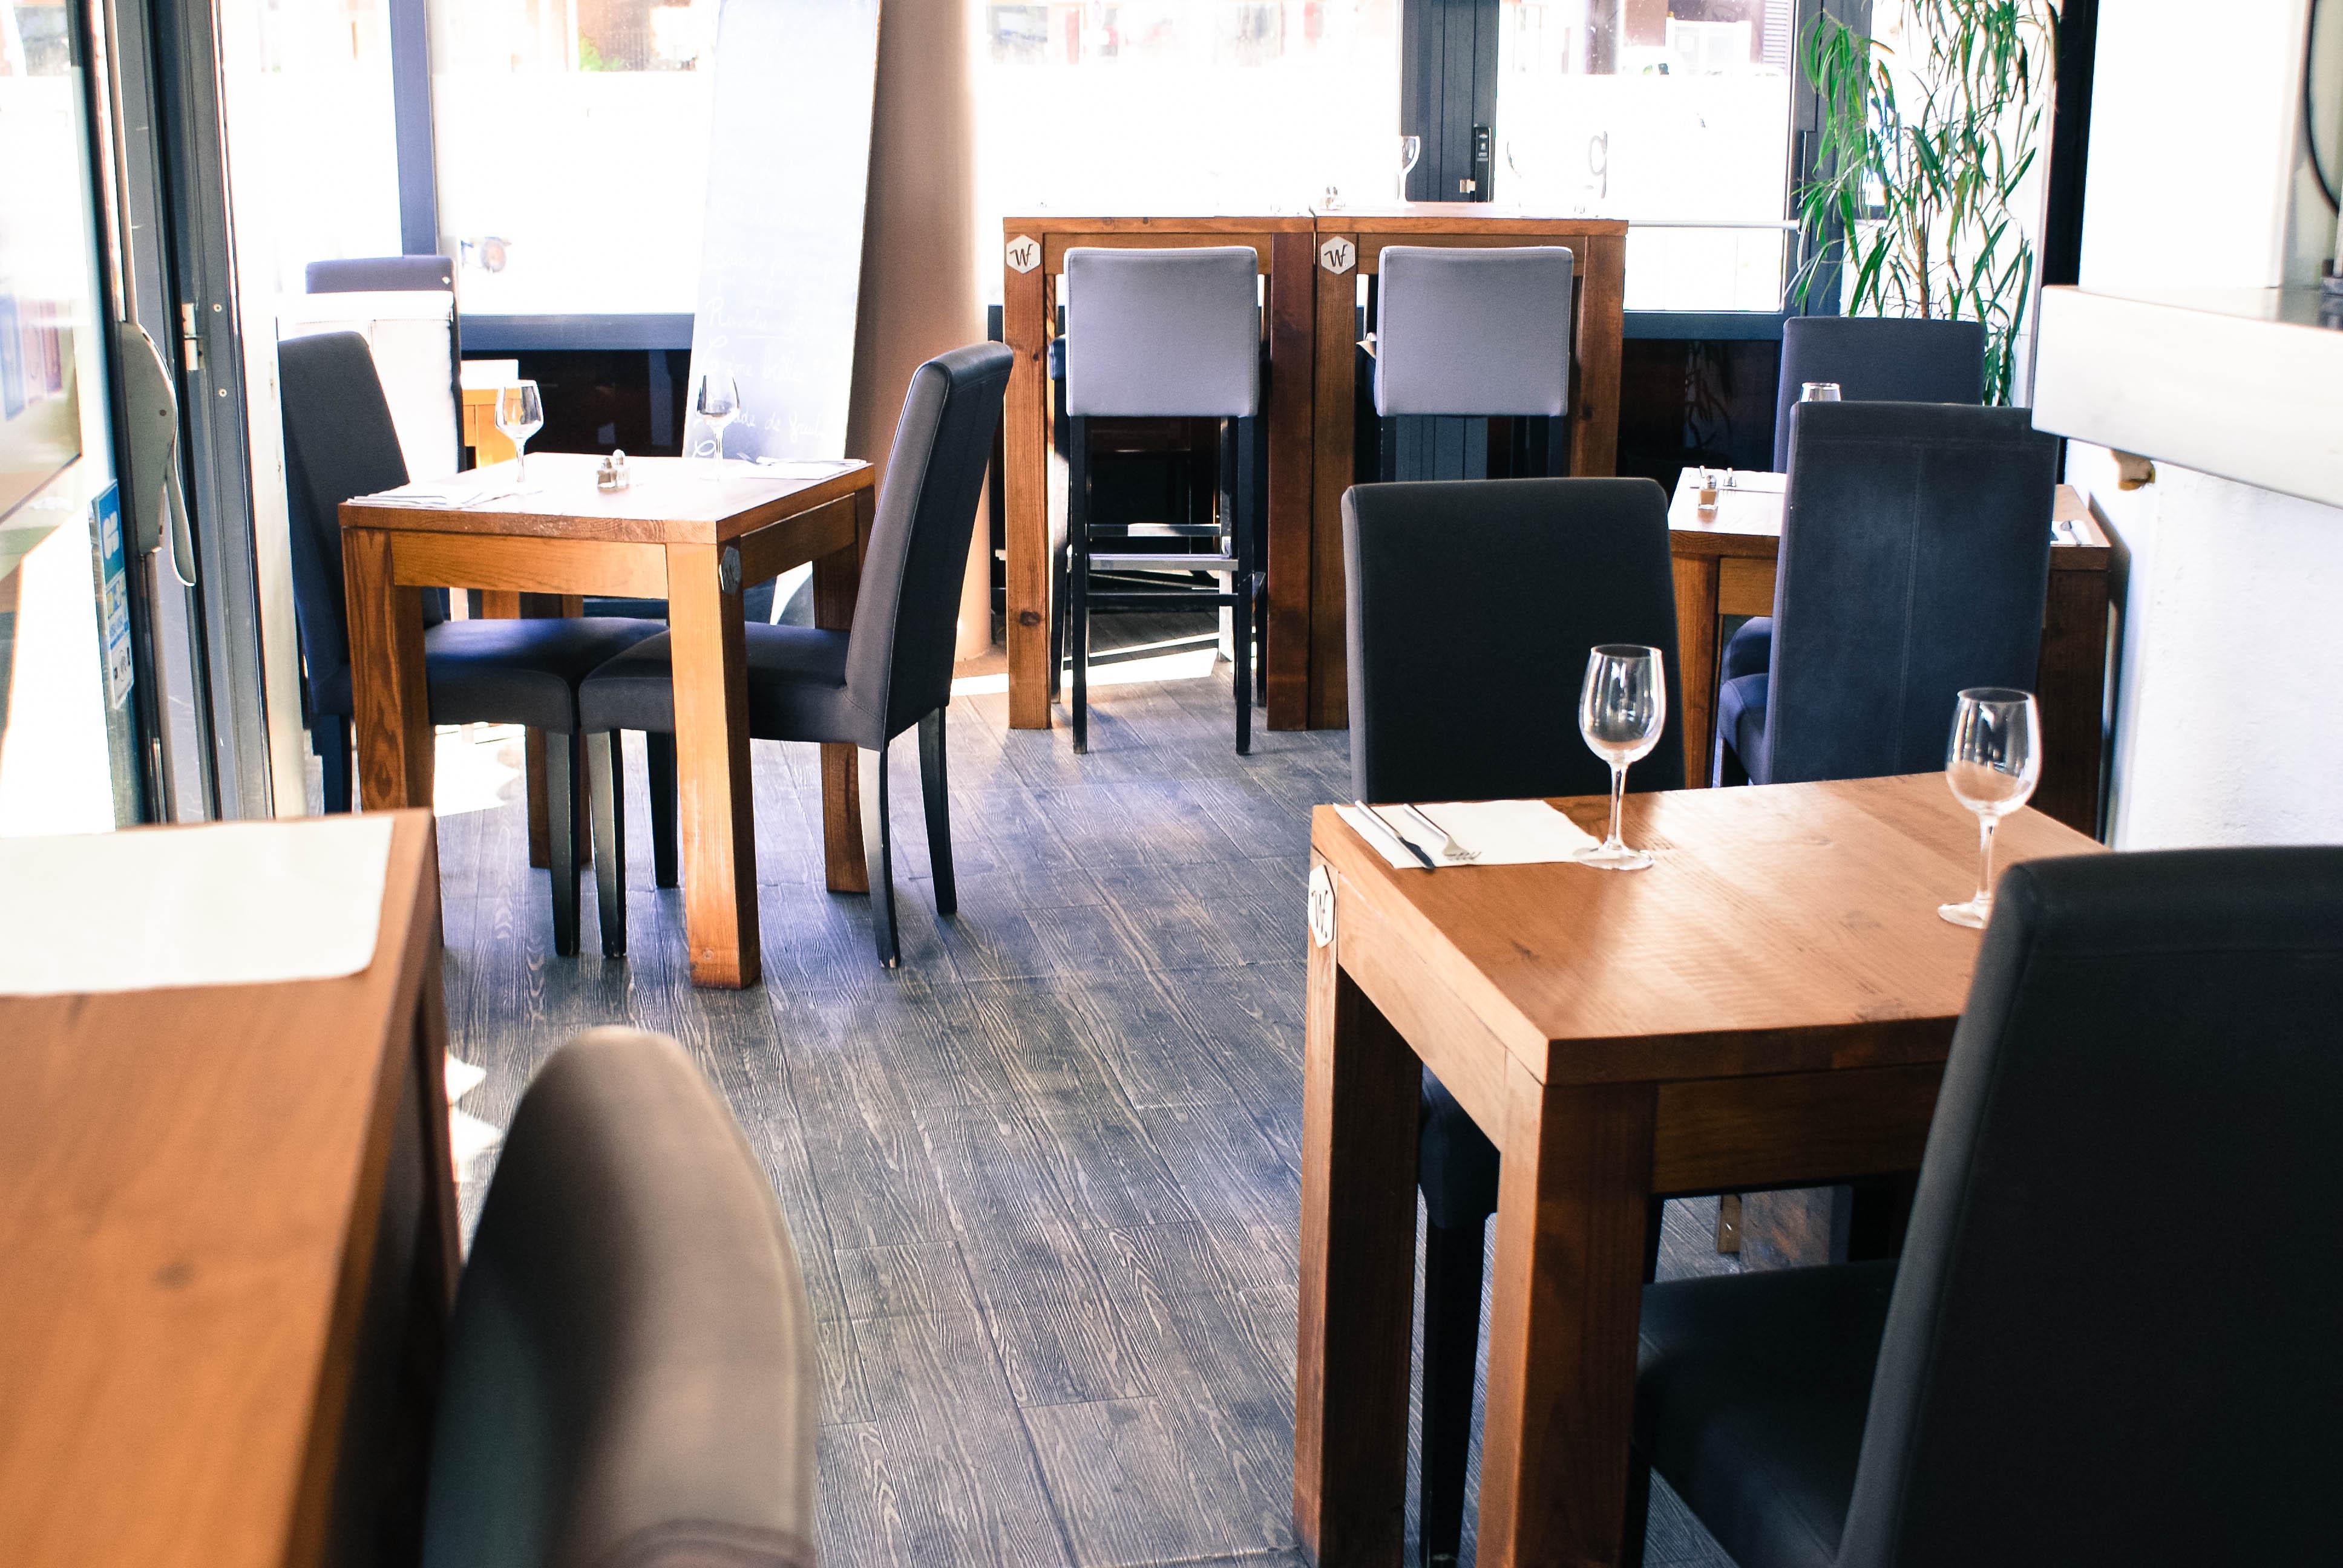 Tables int Le comptoir 3